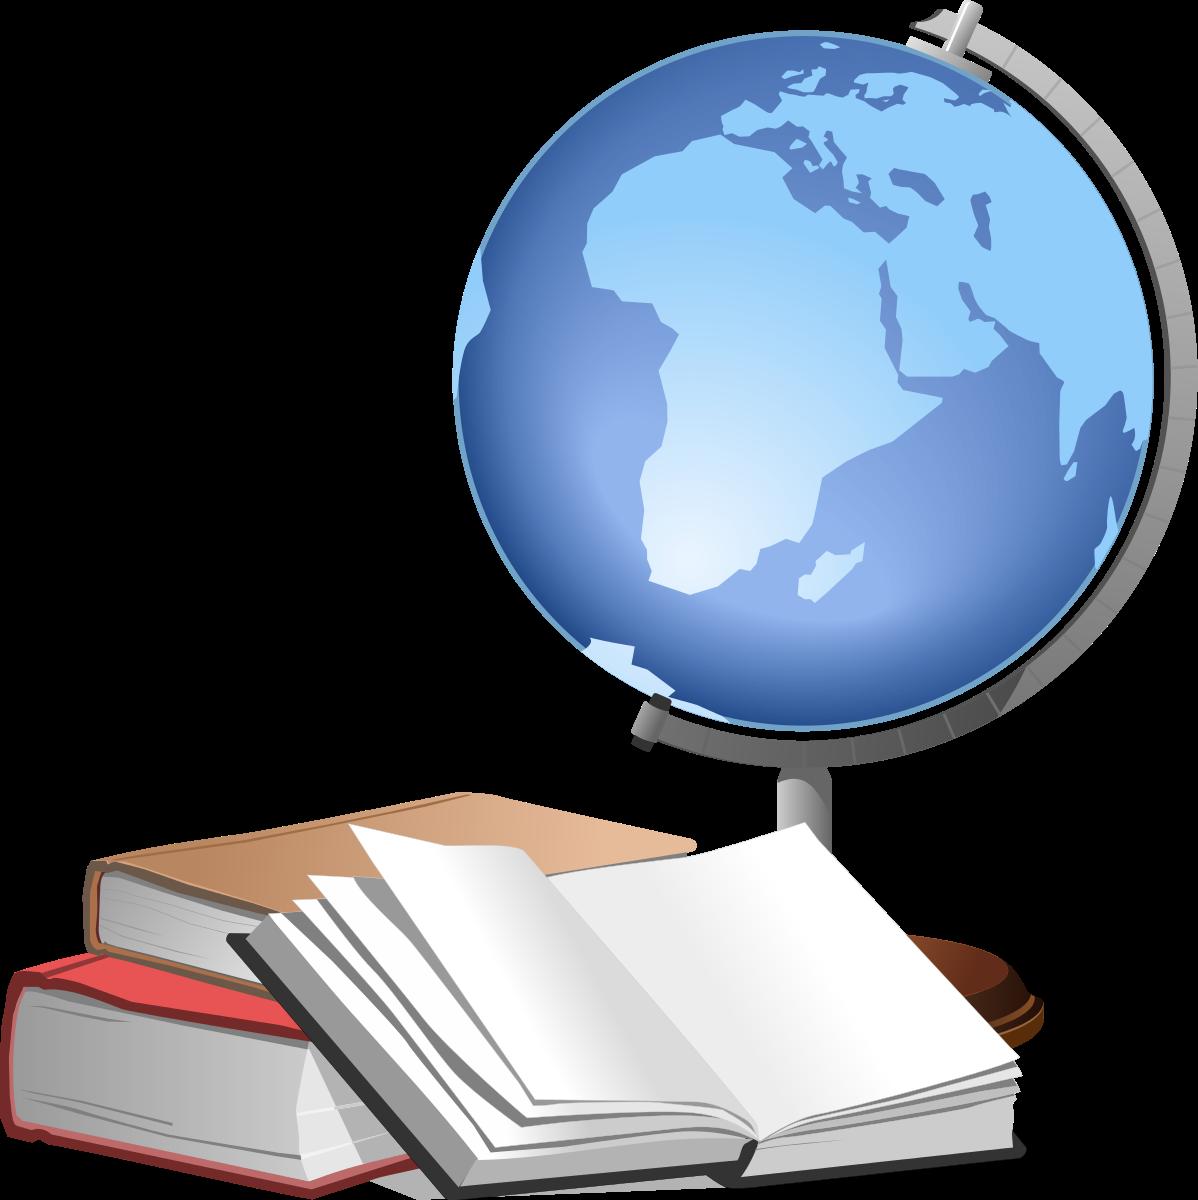 Глобус книги картинка